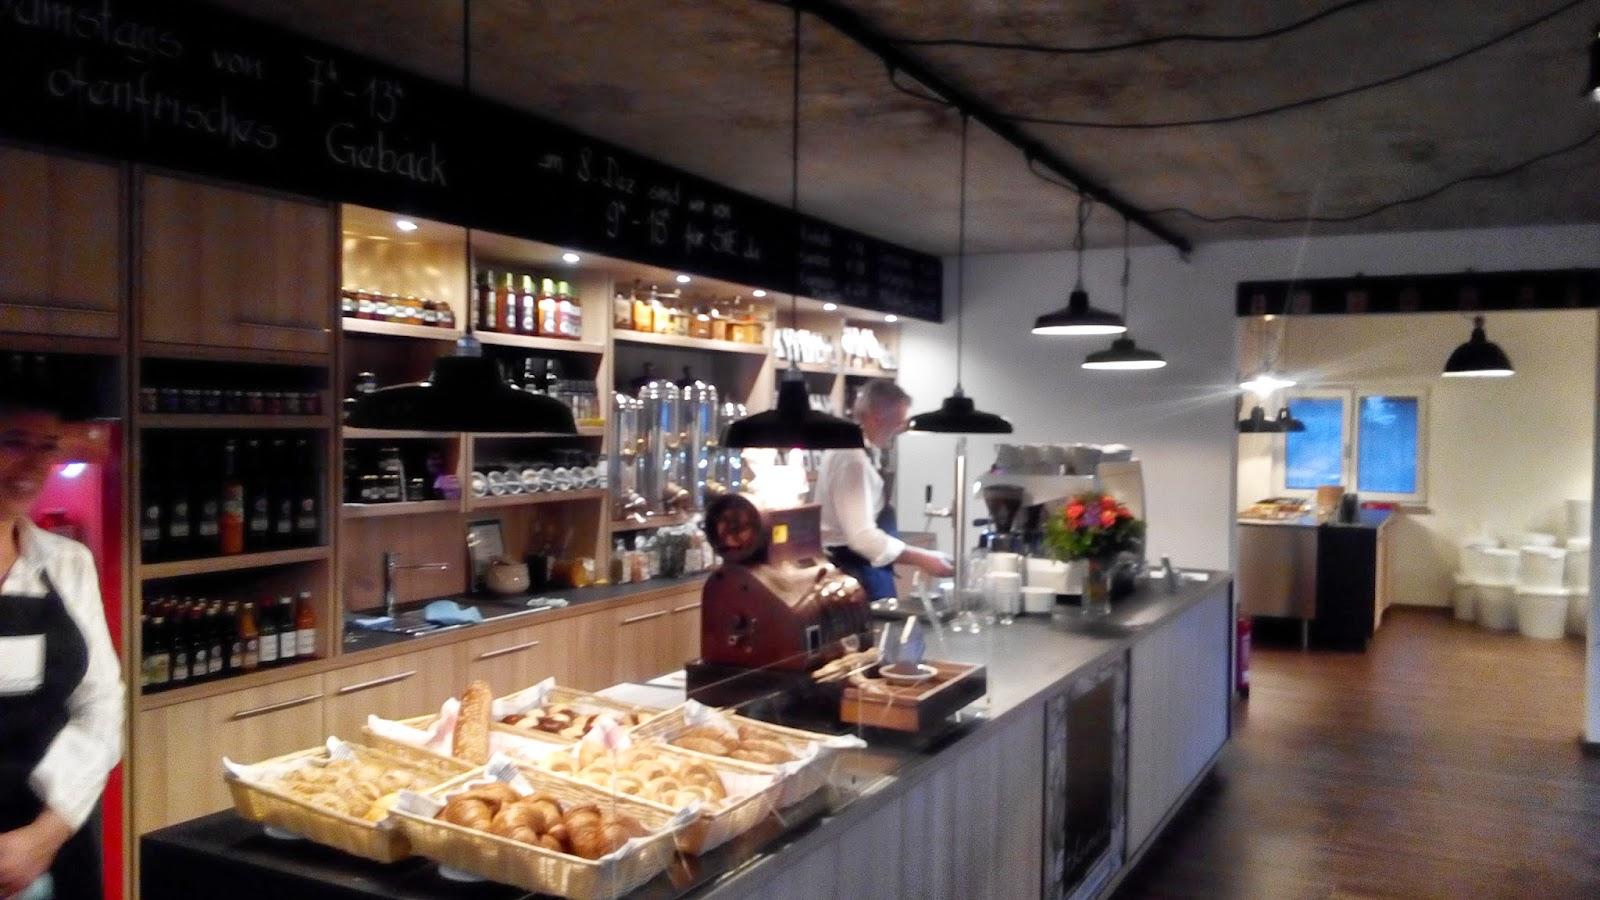 Thomas Kaffee & Genussmanufaktur – die 1. Kaffeerösterei in Telfs